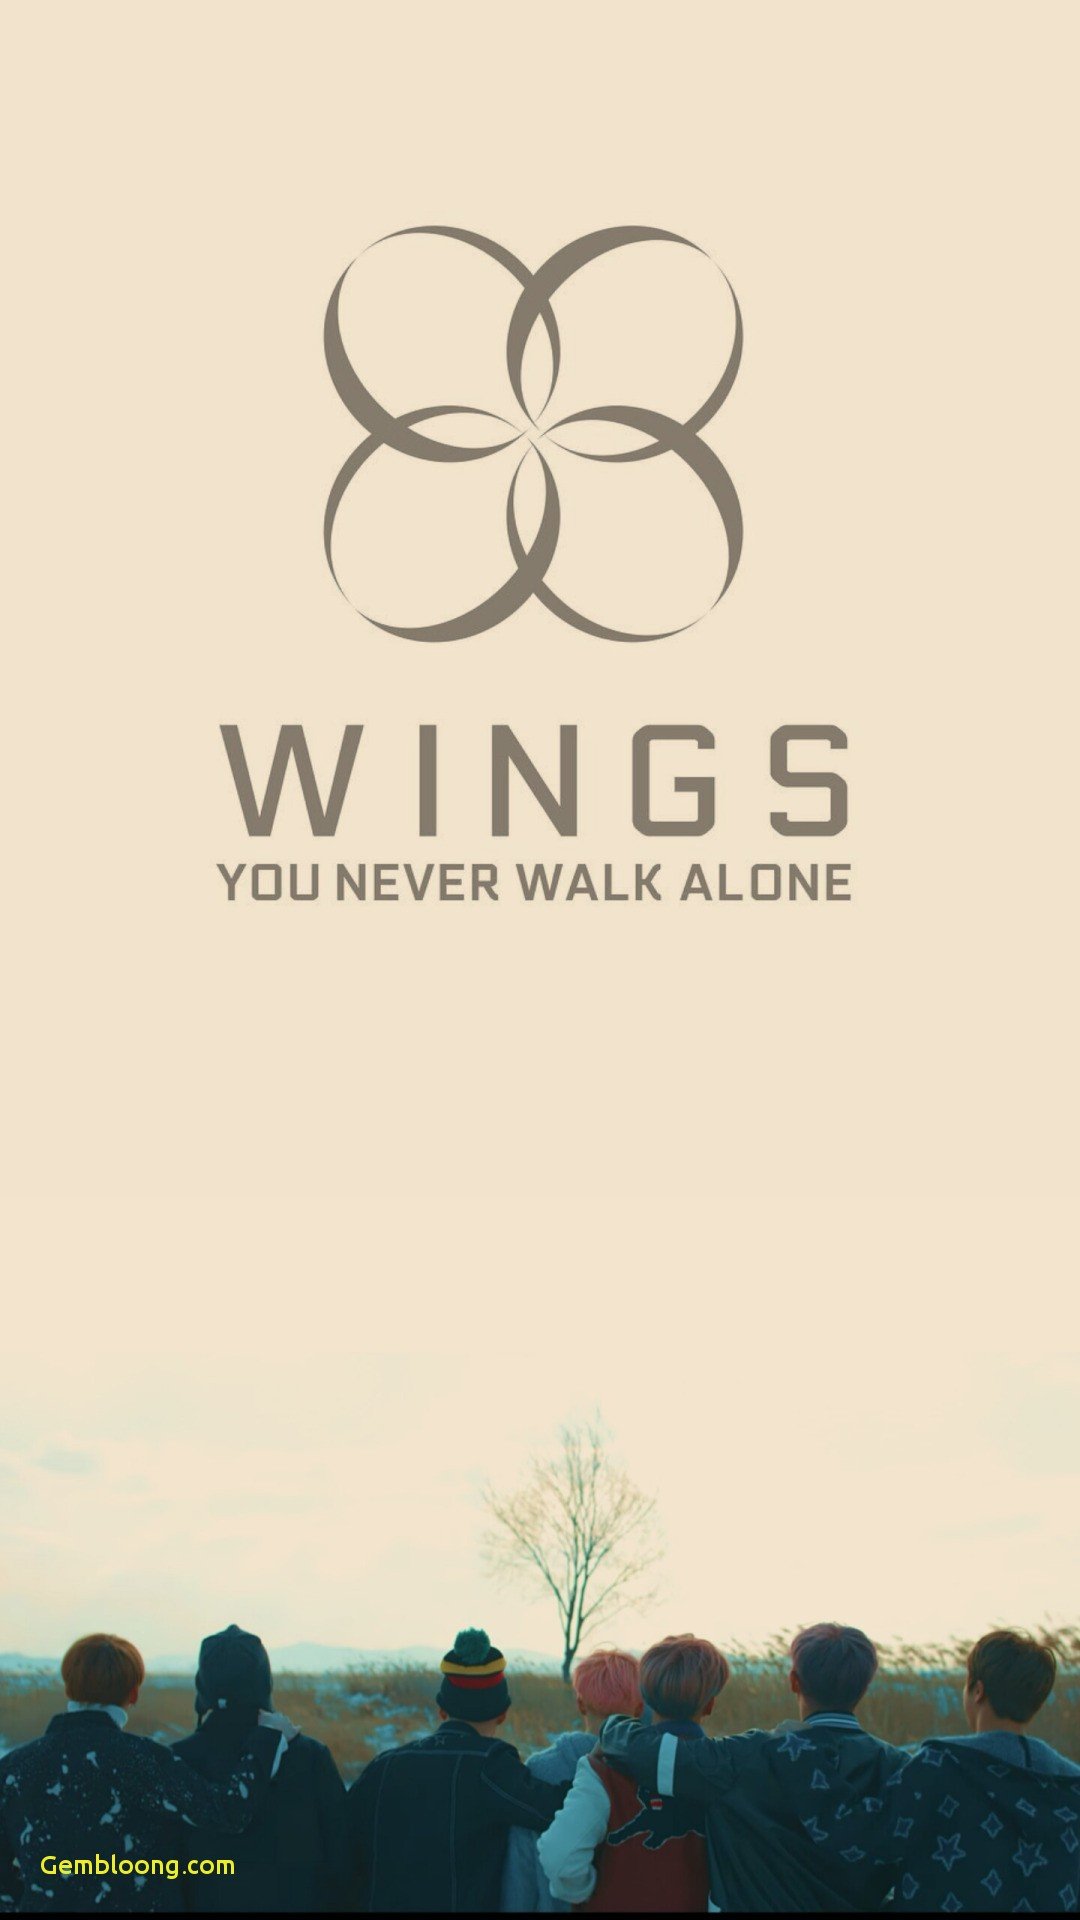 Bts Tumblr Wallpaper Bts Wings You Never Walk Alone Logo